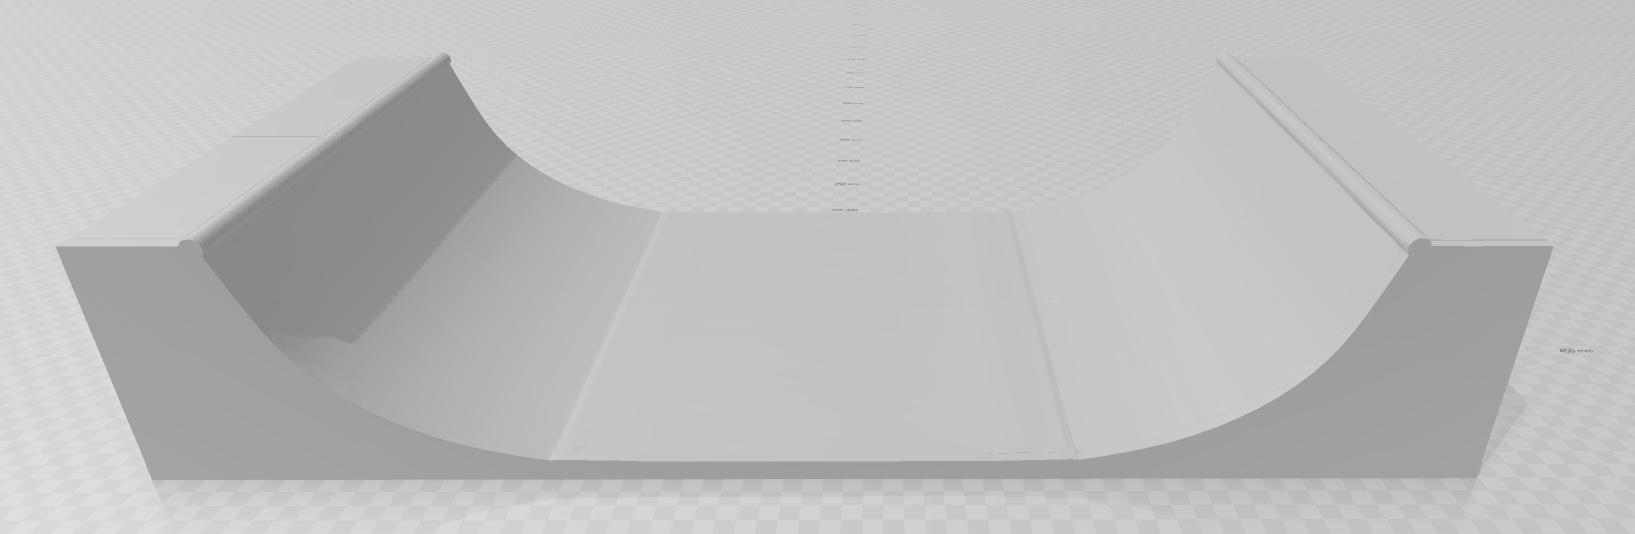 Finger Board Mini Ramp